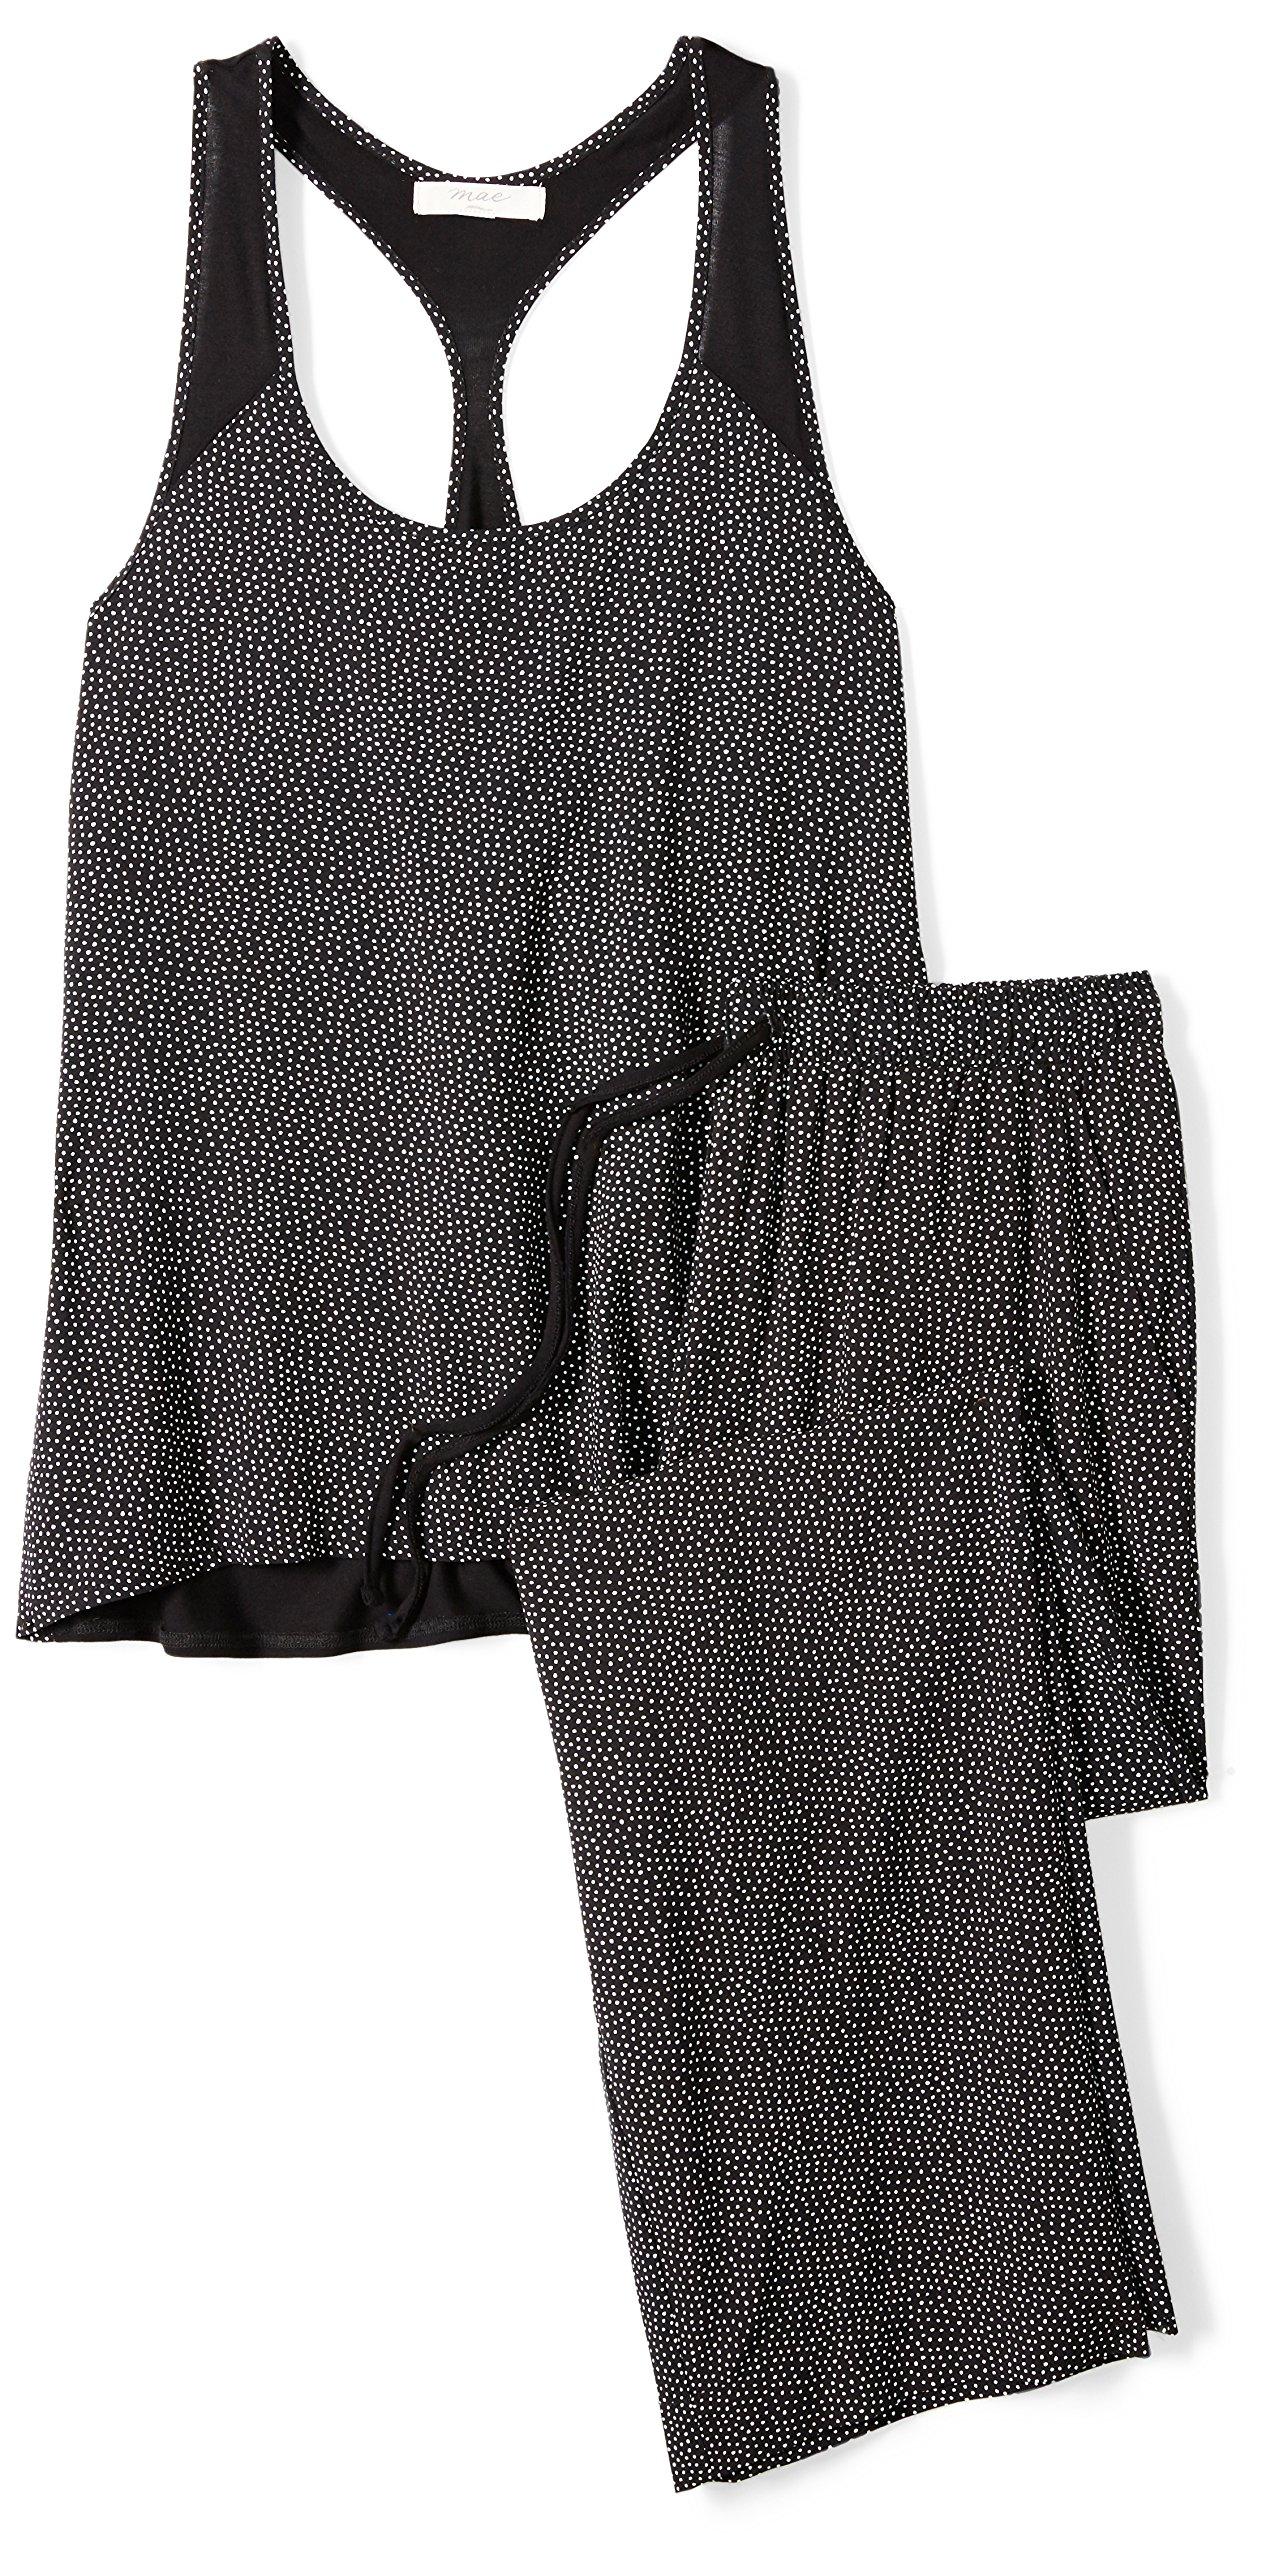 Amazon Brand - Mae Women'S Sleepwear Racer Back Pajama Set -